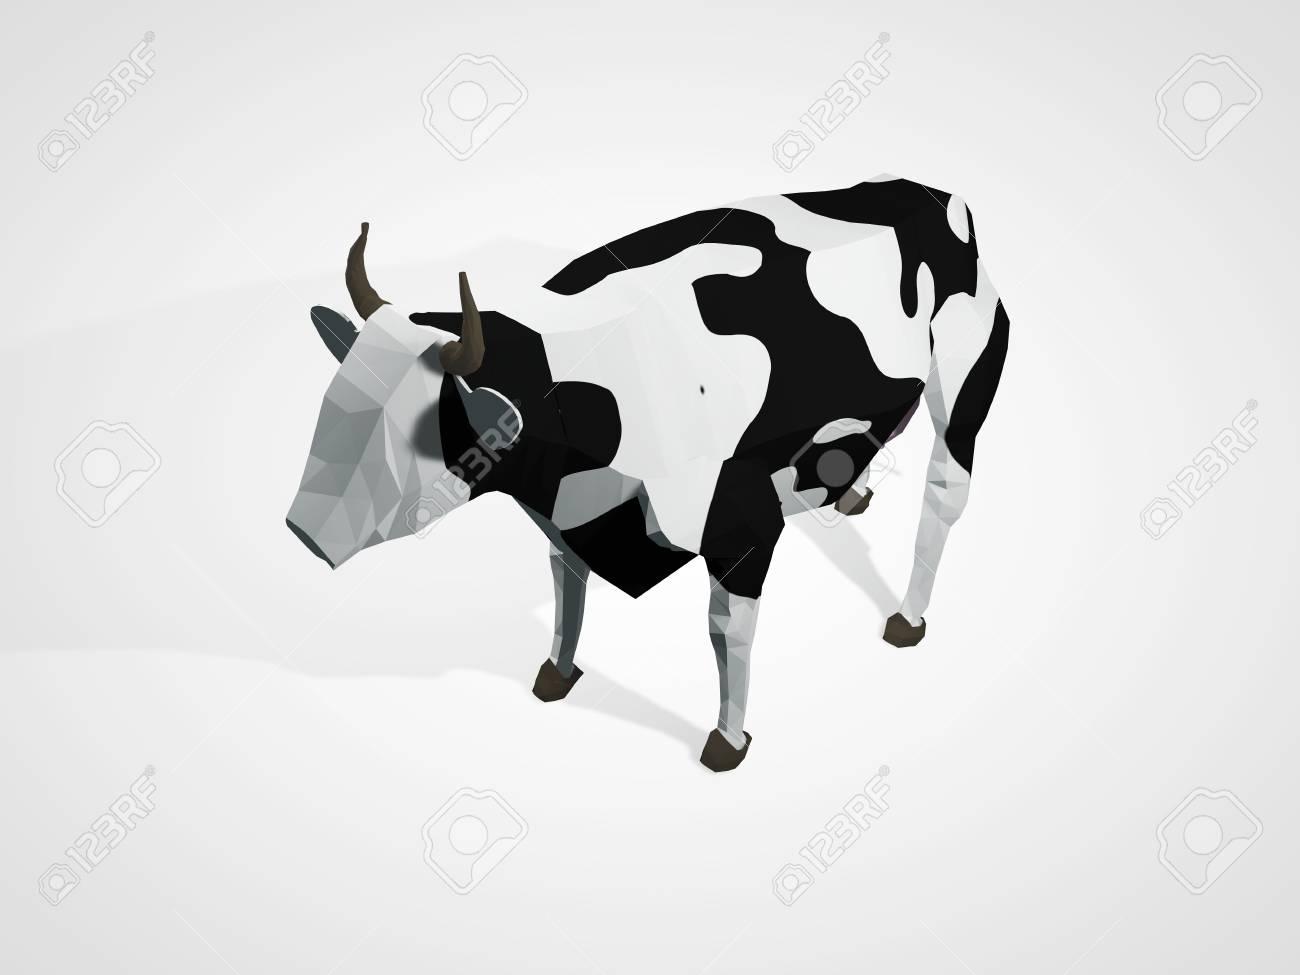 3D Illustration Of Origami Cow Polygonal Geometric Style Standing Full Length Holstein Black